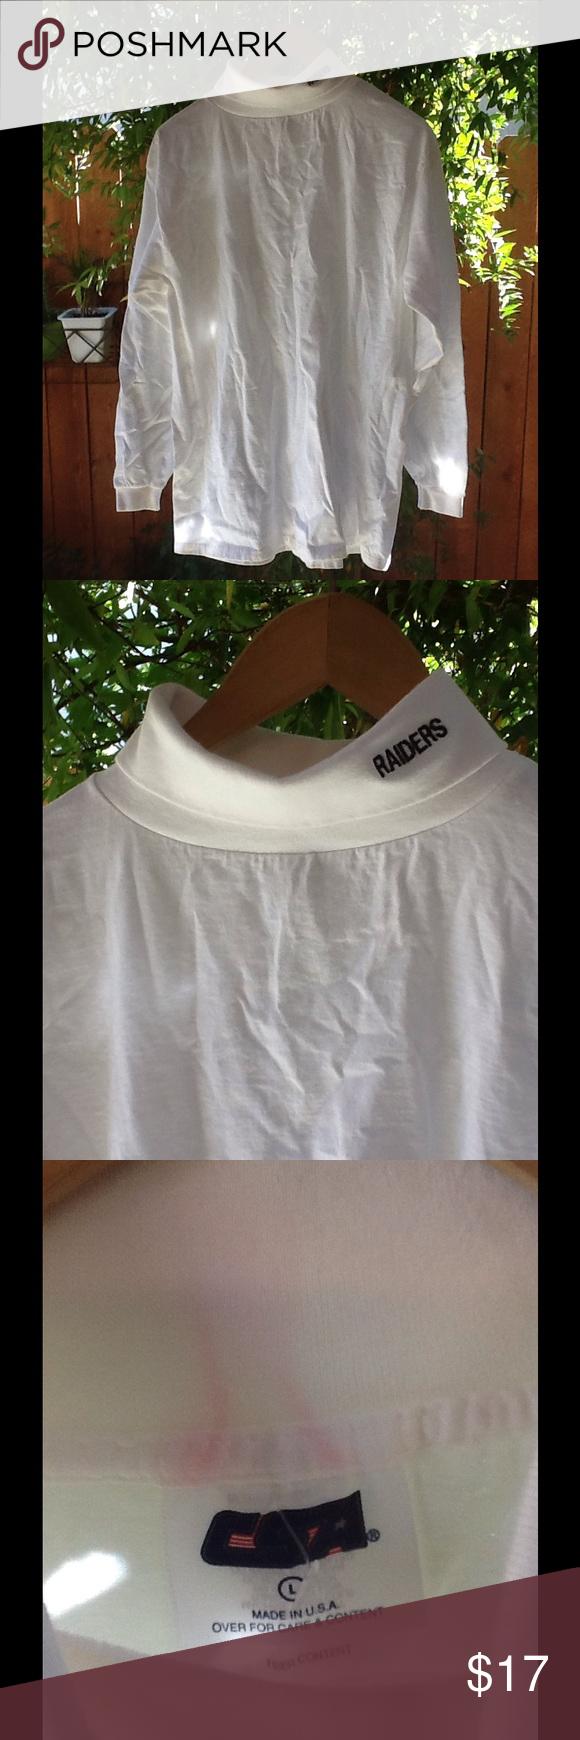 a757e62d Vintage Raiders 90's NFL Turtleneck Shirt Large 100% cotton, long sleeve Raiders  turtleneck. Light discoloration inside neckline. Vintage Shirts Tees - Long  ...